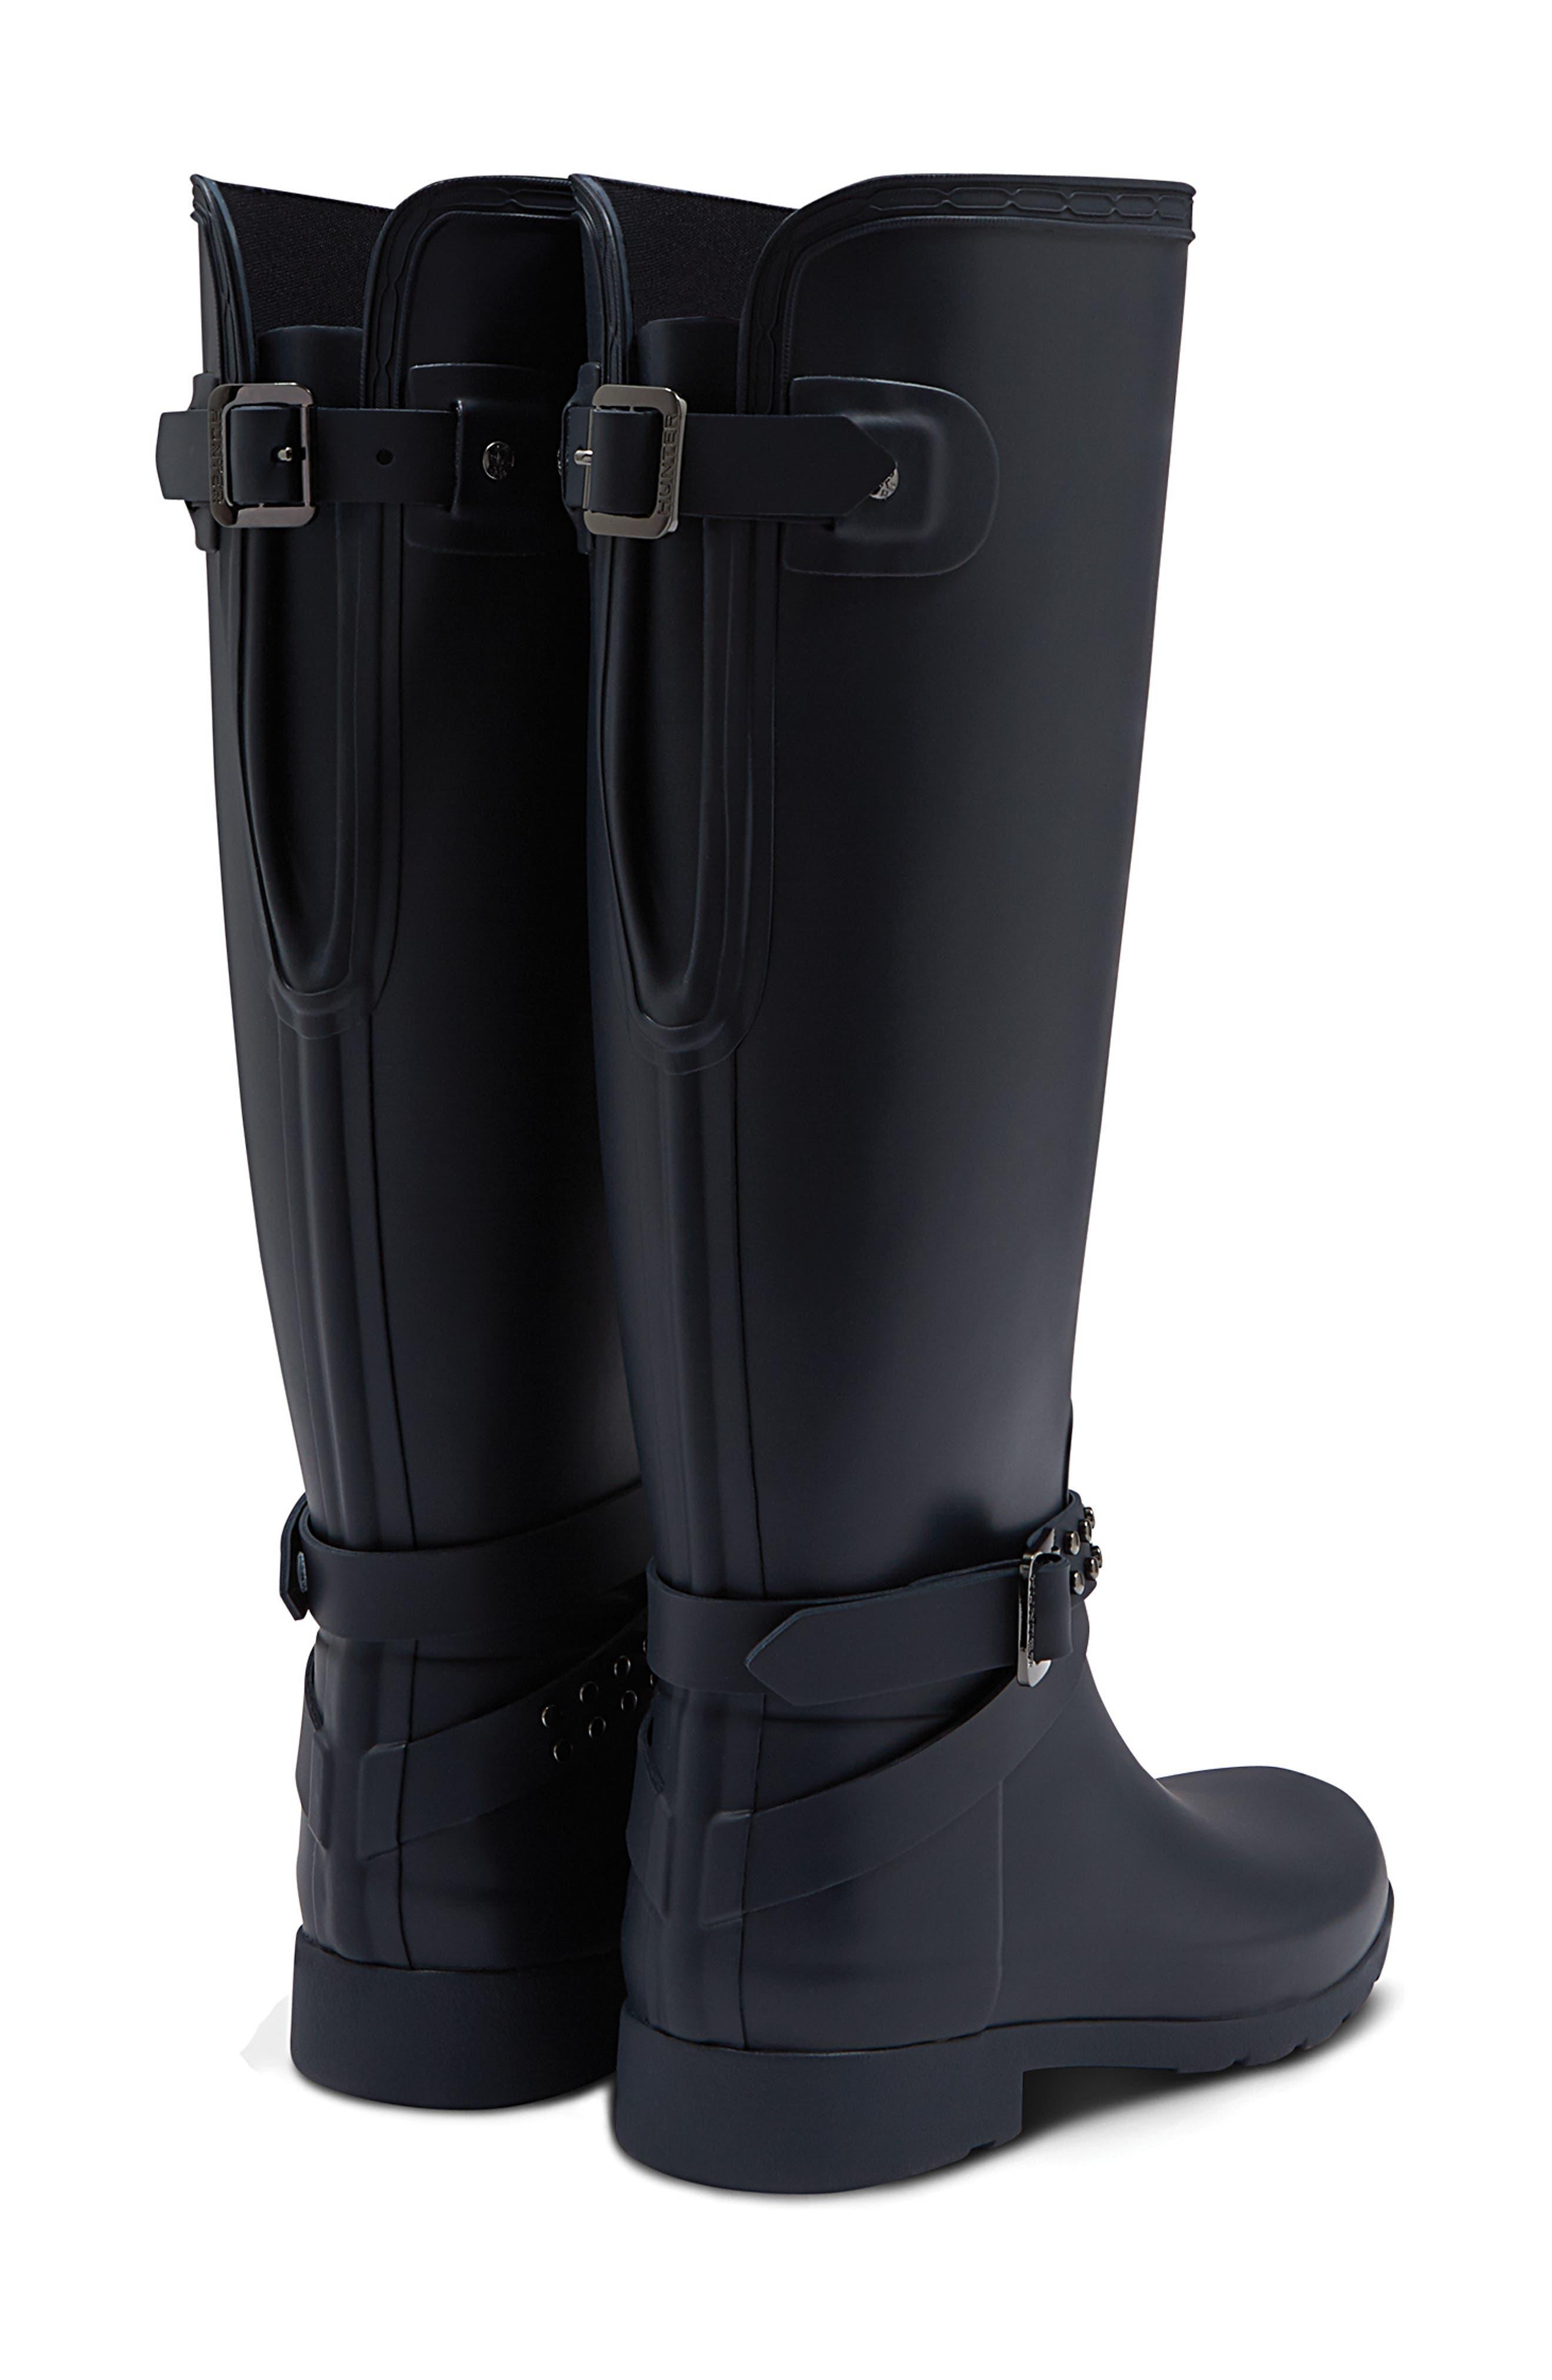 Refined Adjustable Back Knee High Waterproof Rain Boot,                             Alternate thumbnail 2, color,                             NAVY